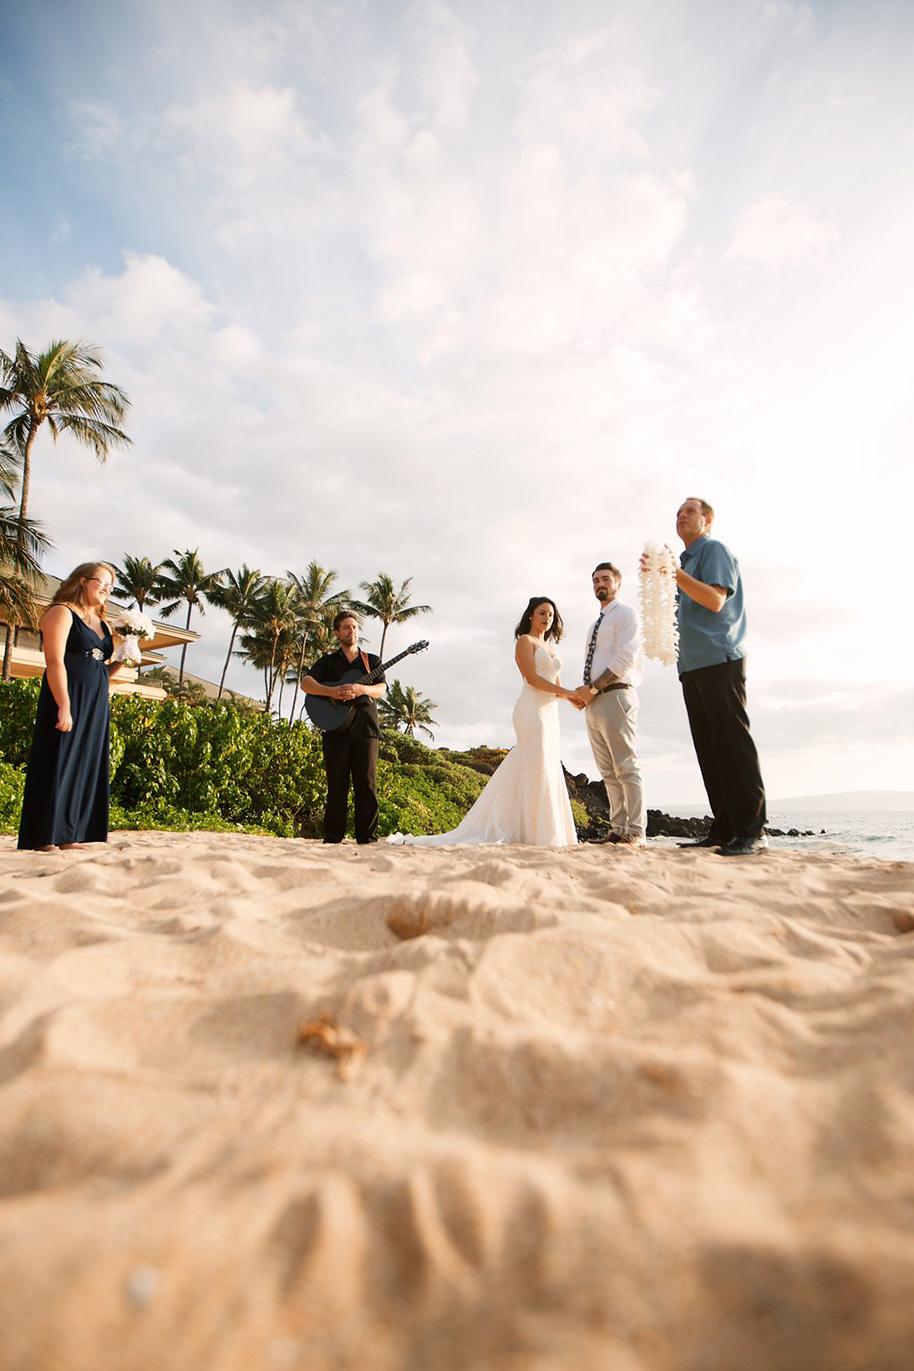 Maui-Beach-Wedding-070616-4.jpg